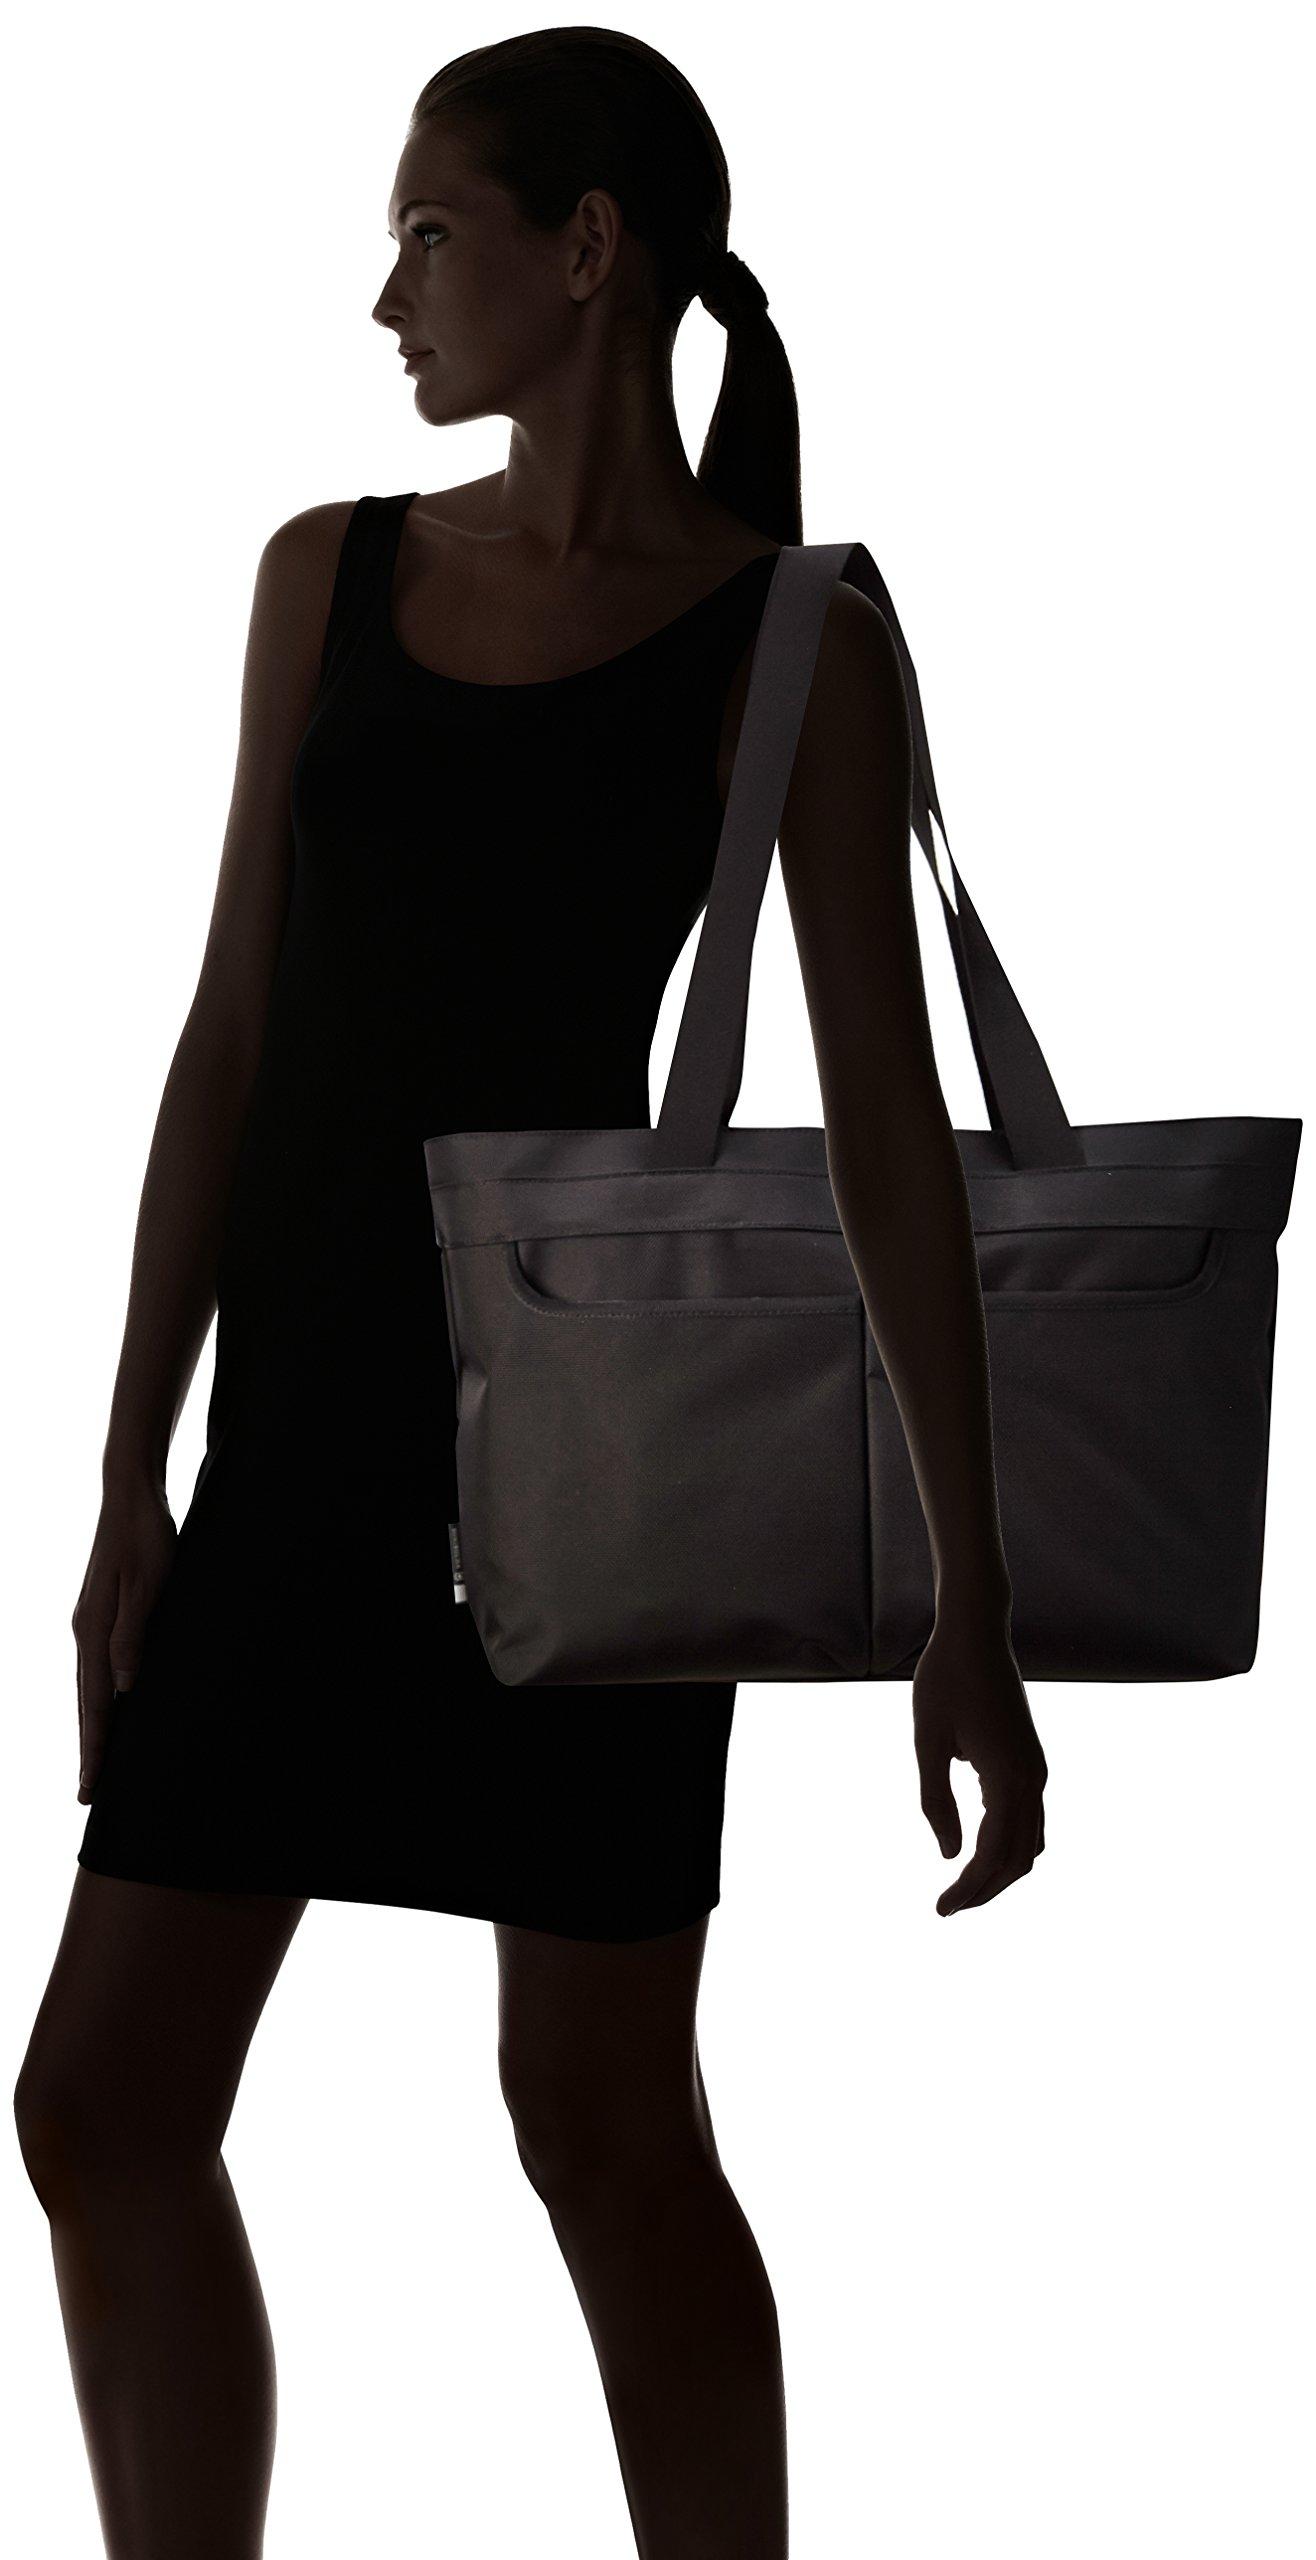 Victorinox Werks Traveler 5.0 WT Shopping Tote, Black, One Size by Victorinox (Image #7)